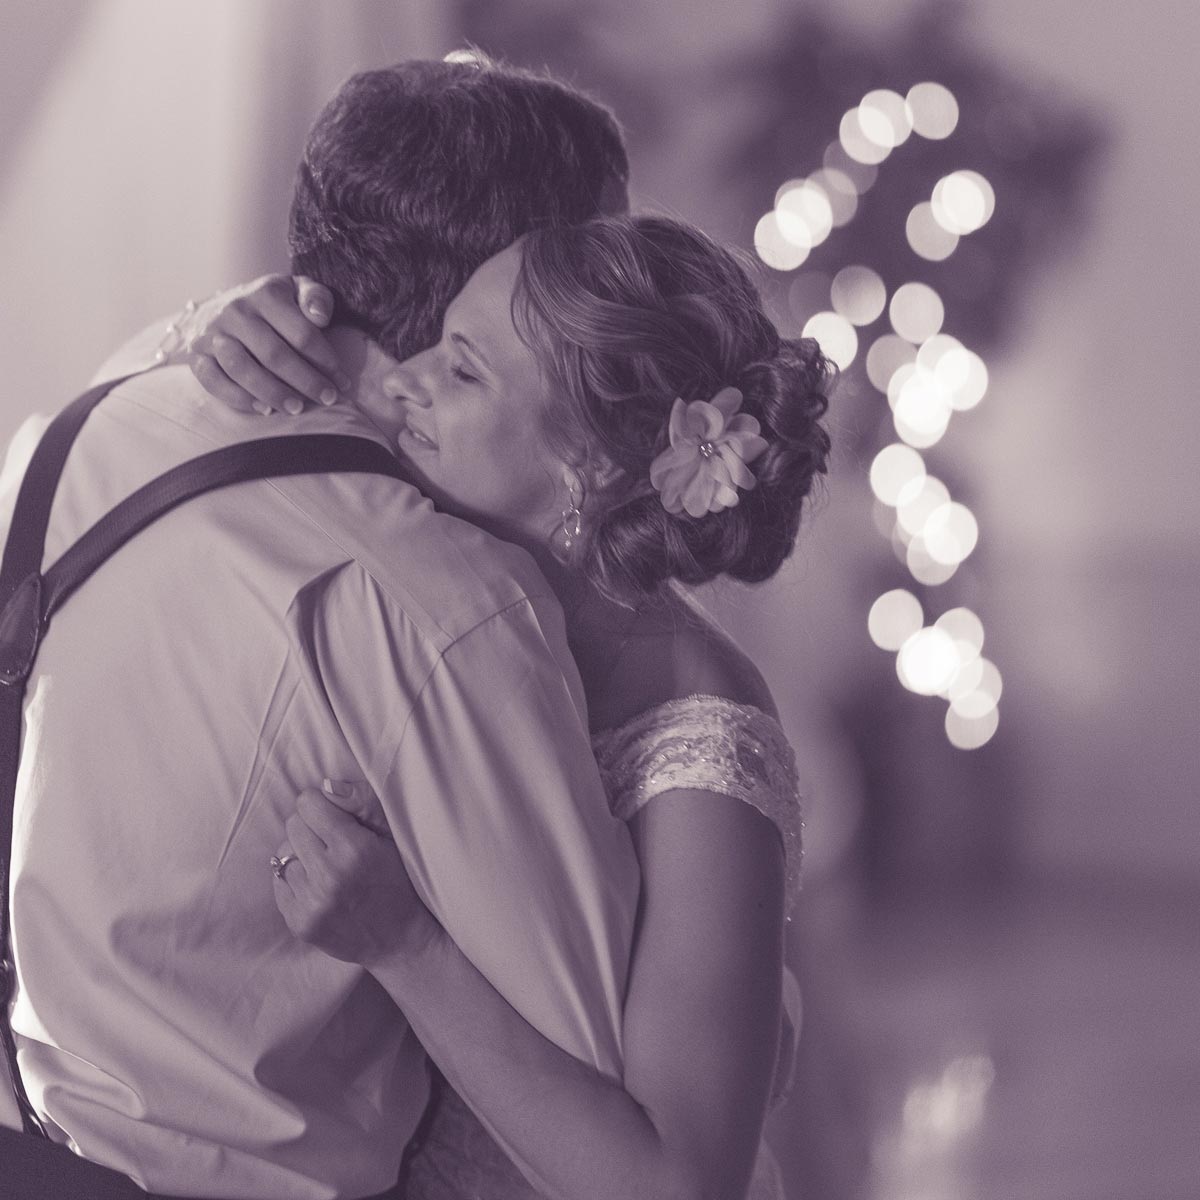 evansville-wedding-photographer-pabst-photo-kokies-echo-valley-(92)